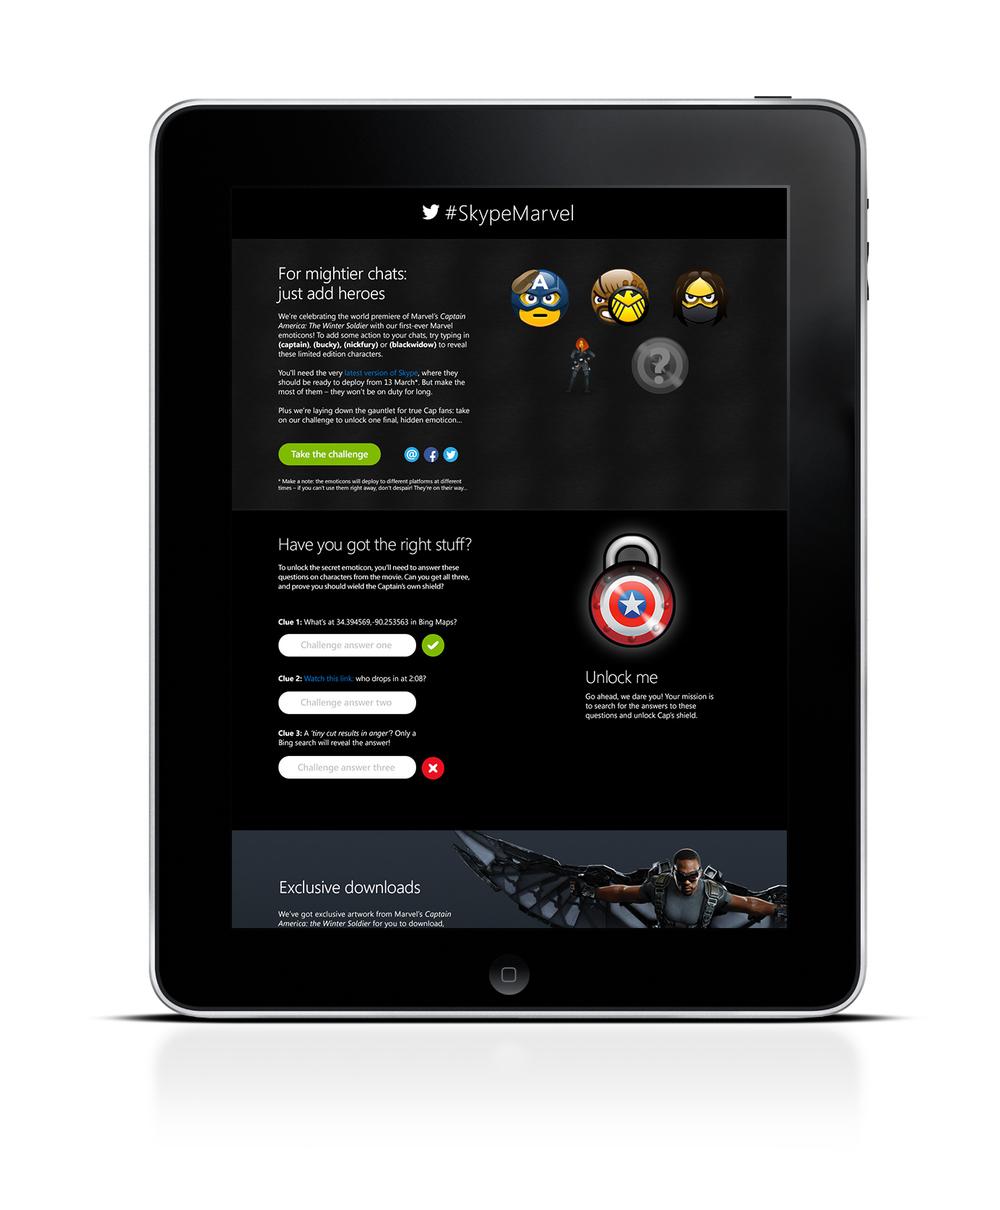 Skype hidden emoticons captain america - Cc97f812facd837c9db49fe7fa2f456d Jpg